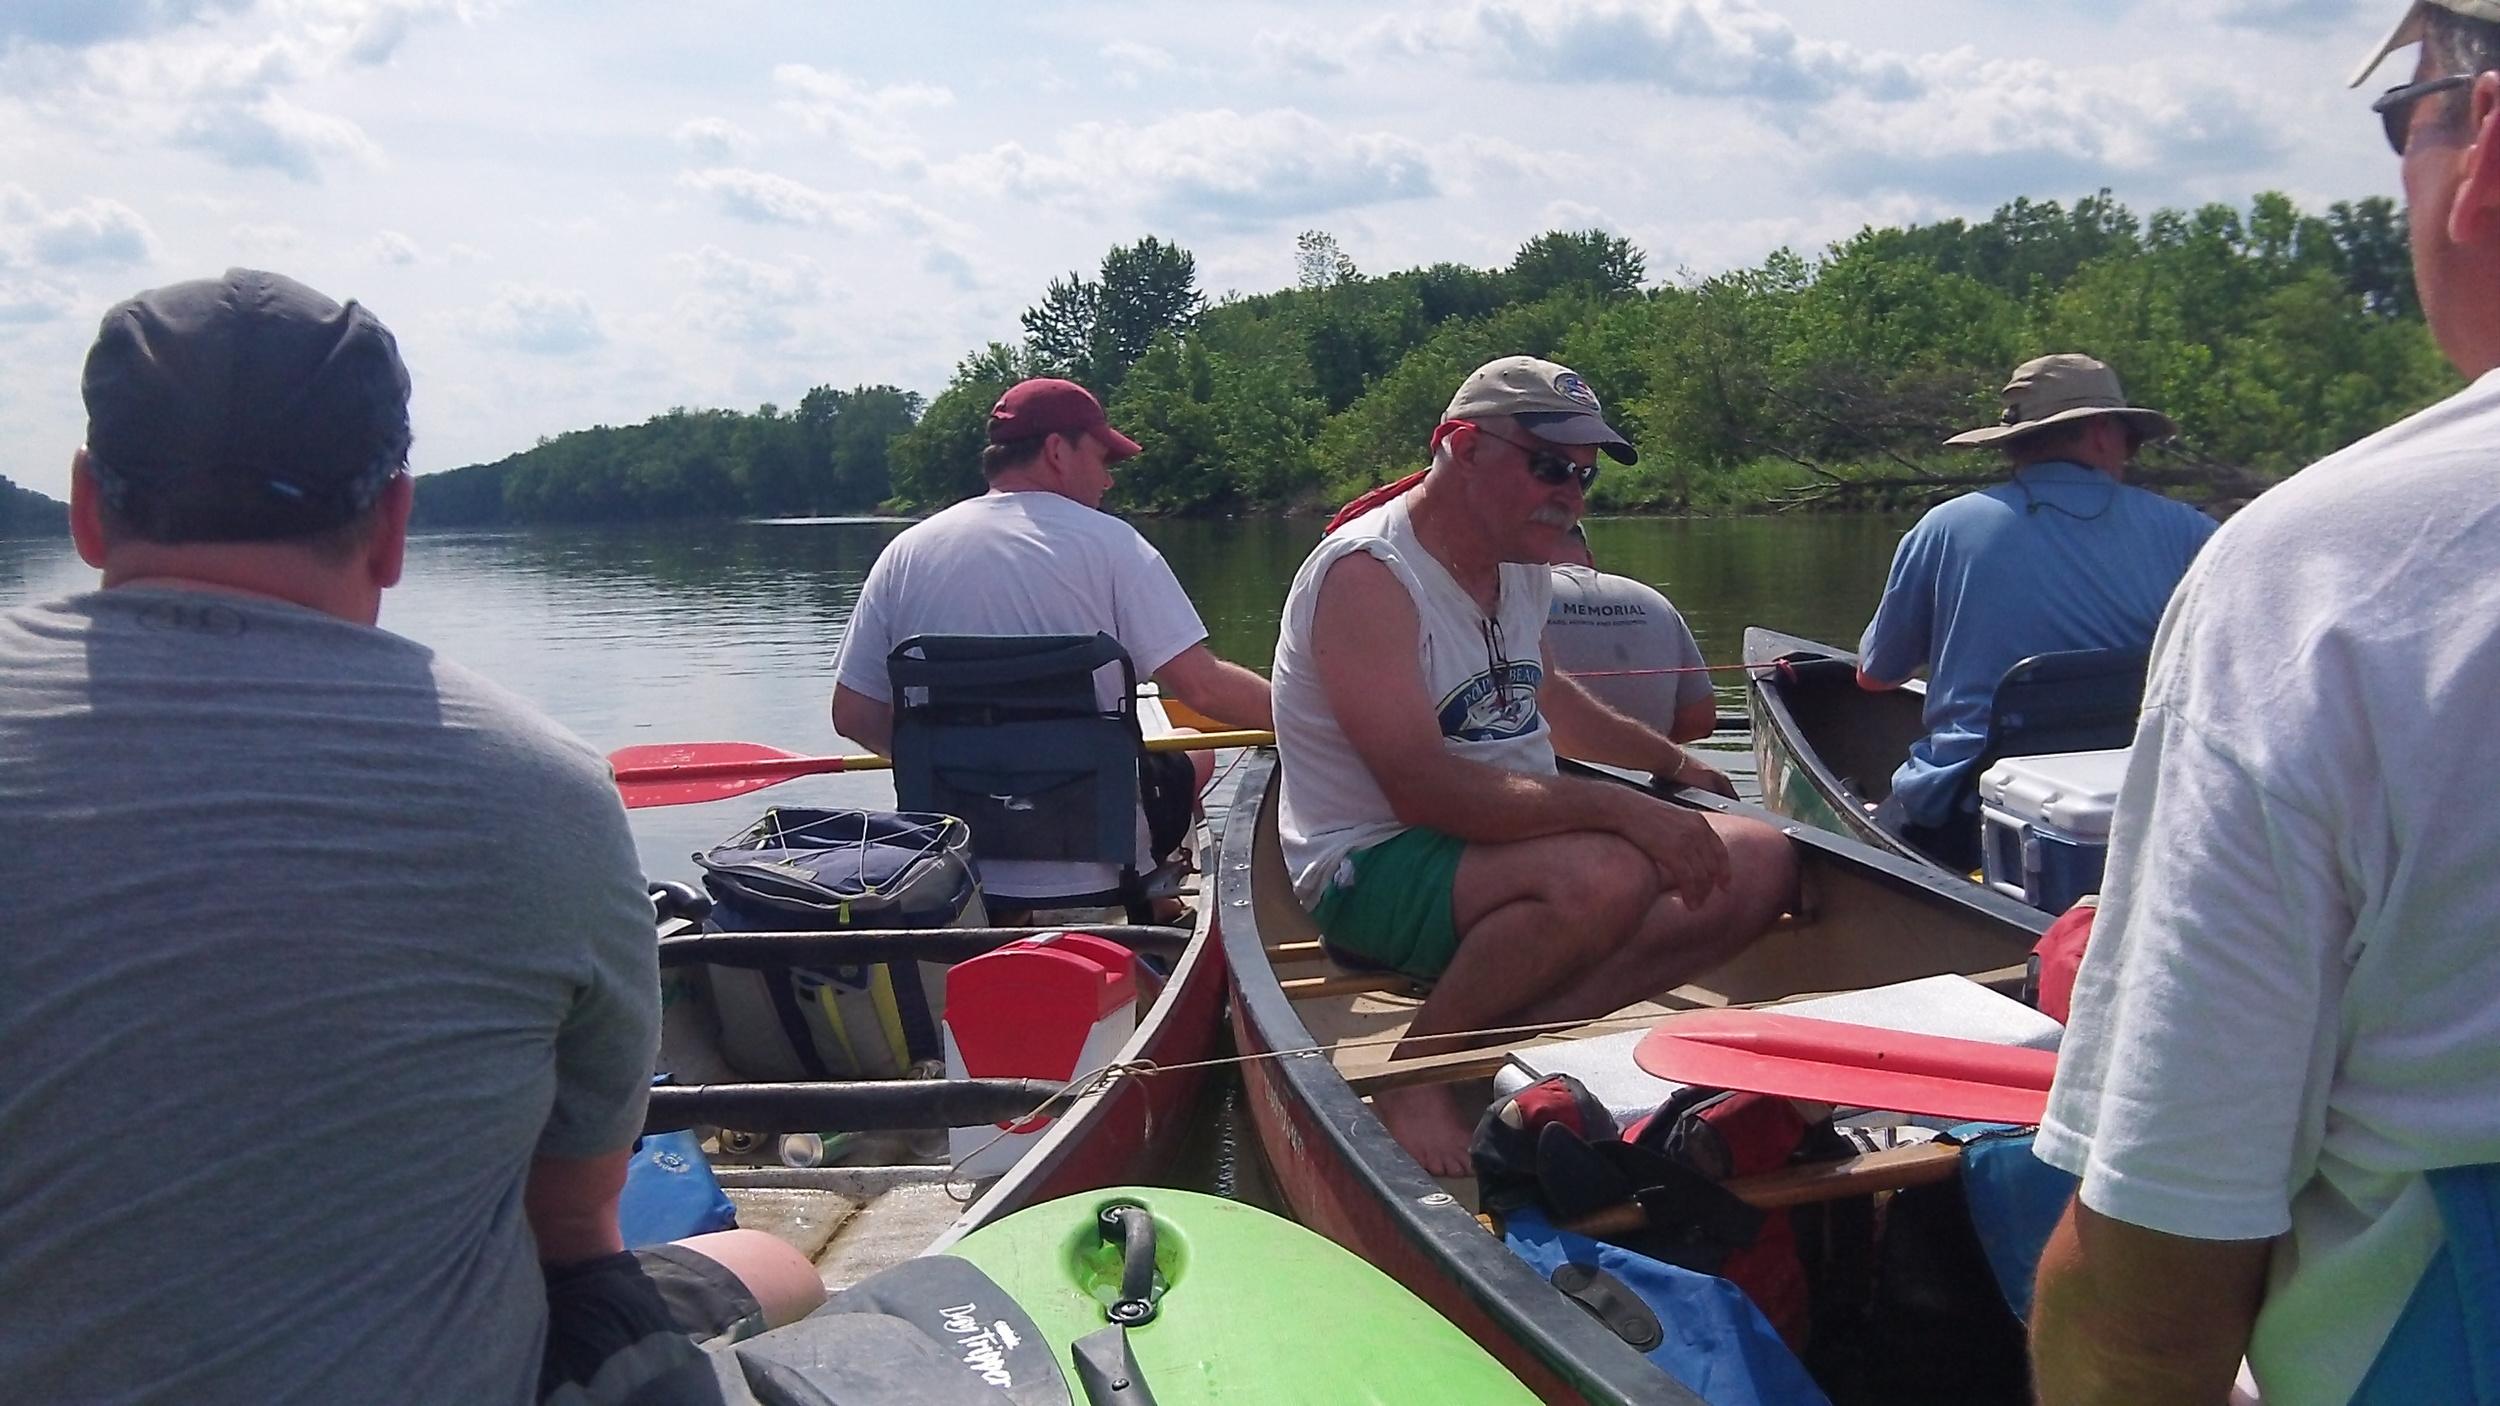 Saturday 2012 - the flotilla